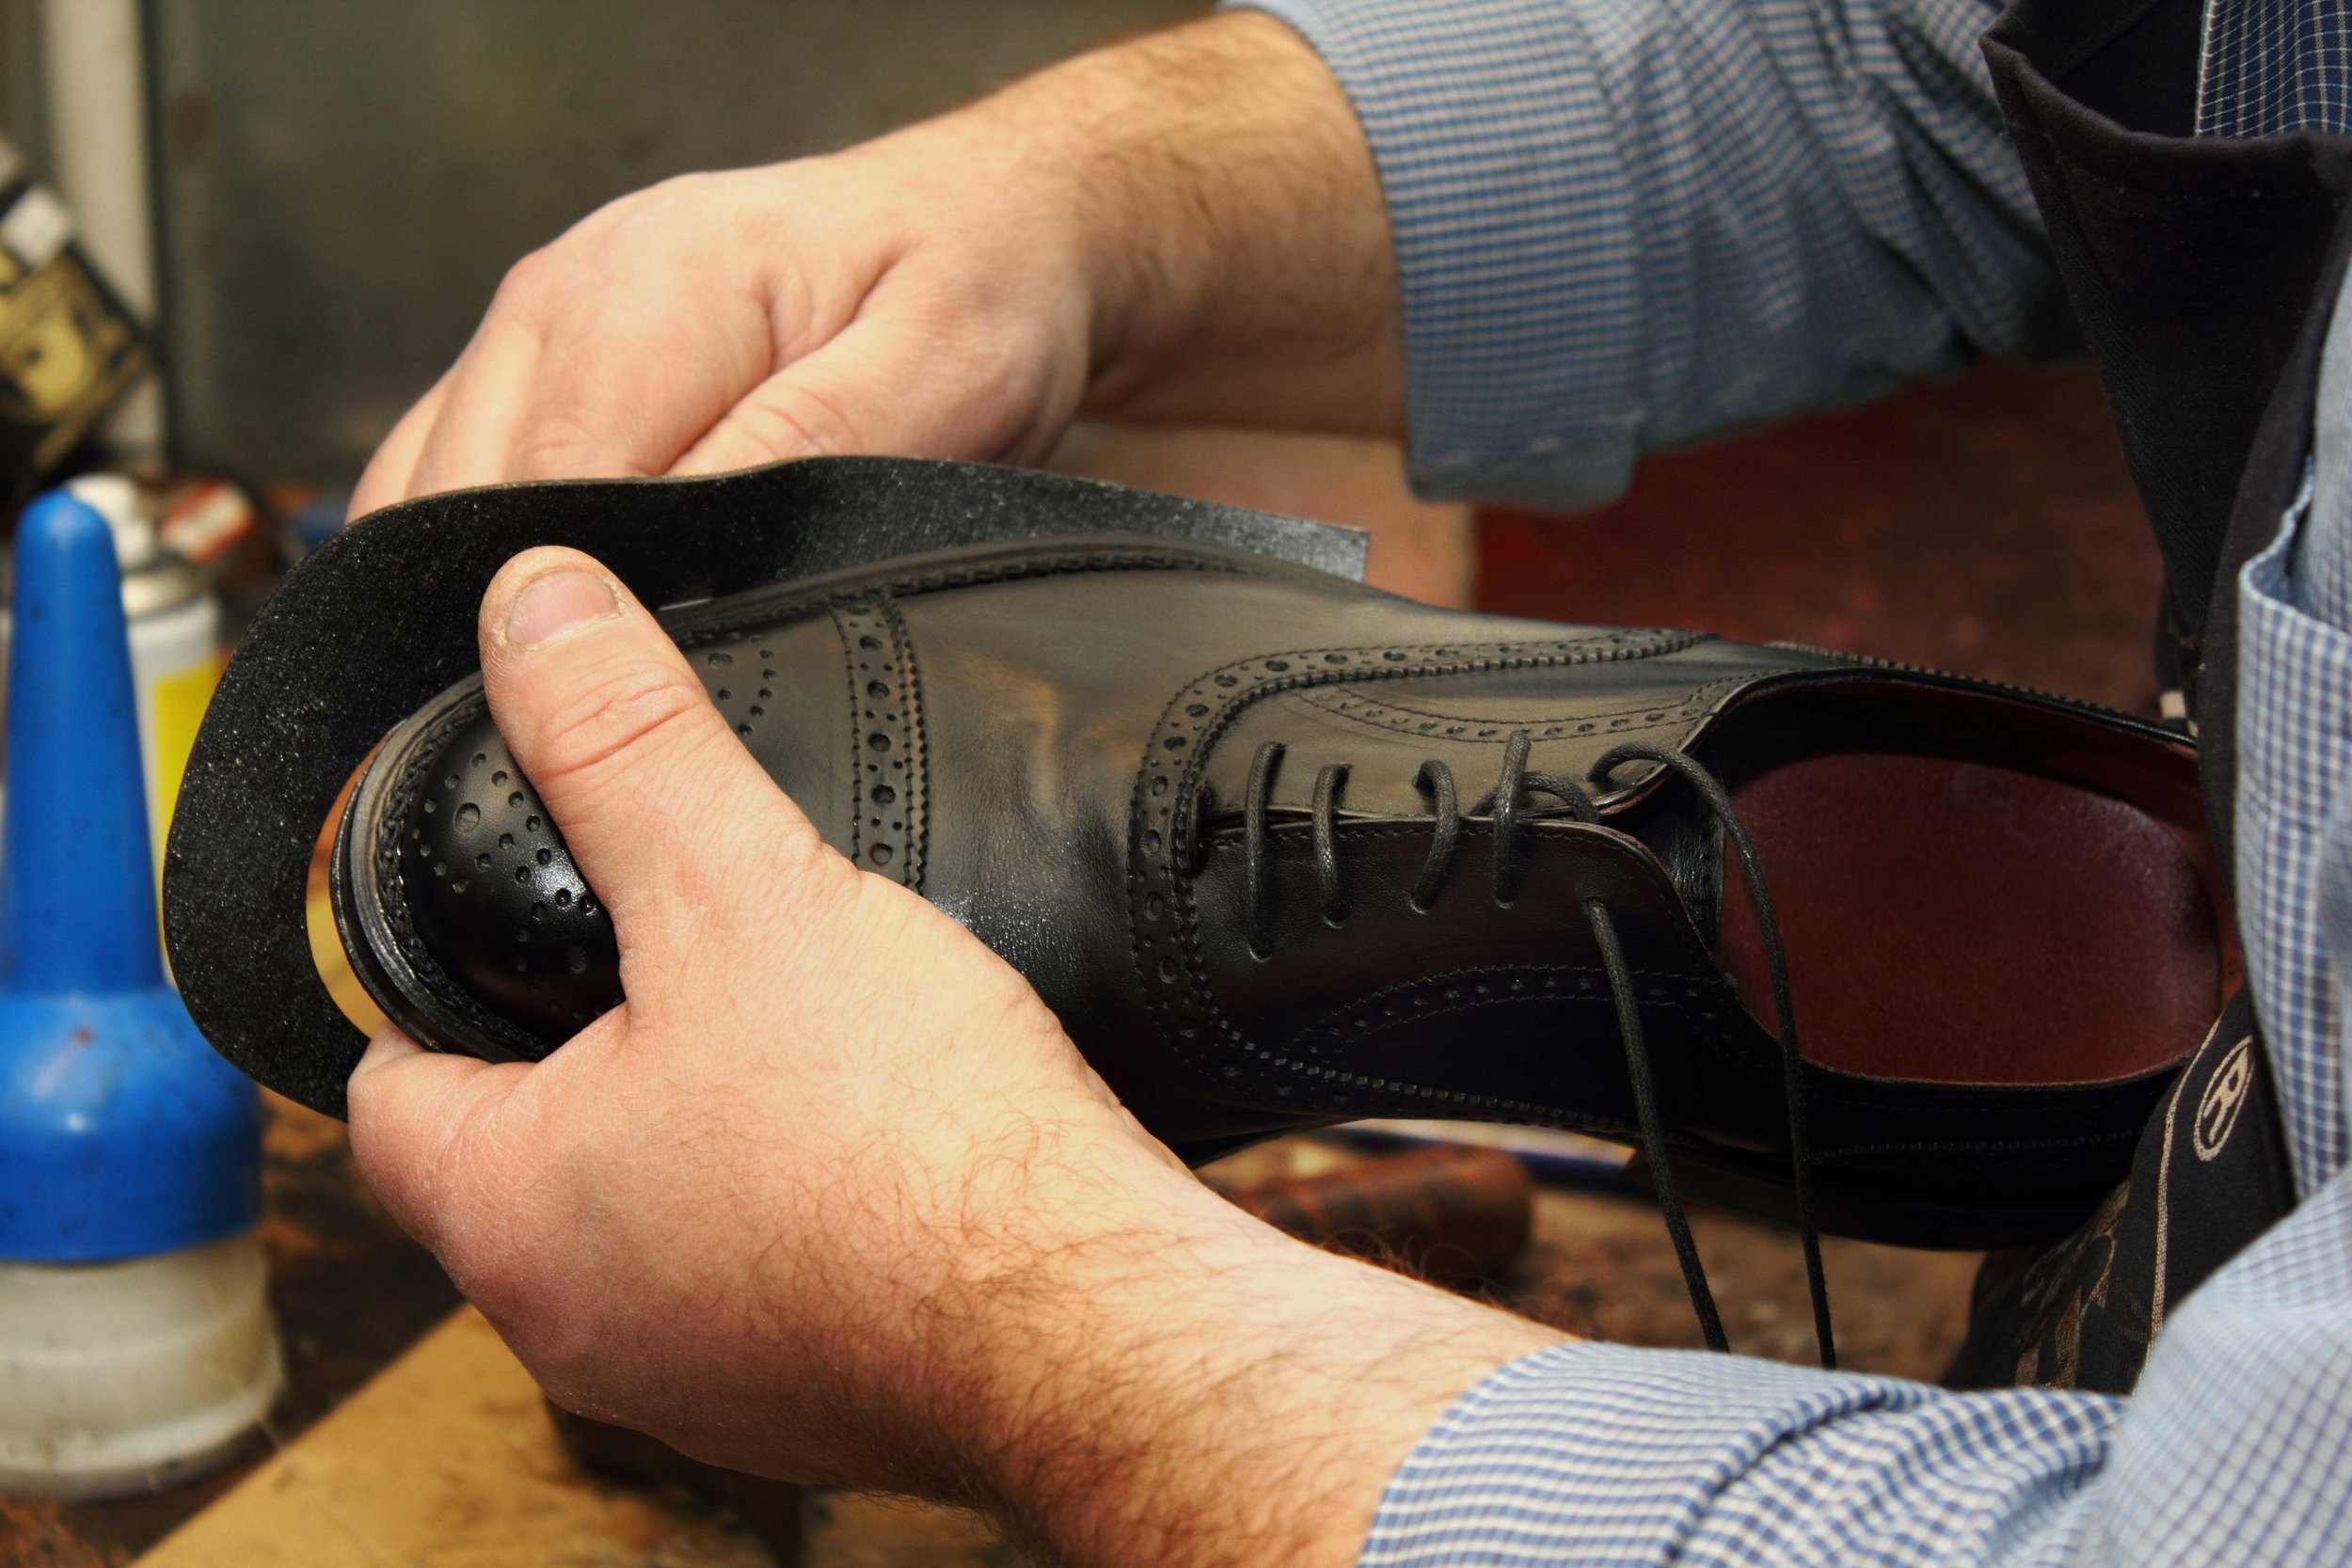 Shoes-in-the-making---boty-ve-vyrobe-1.jpg